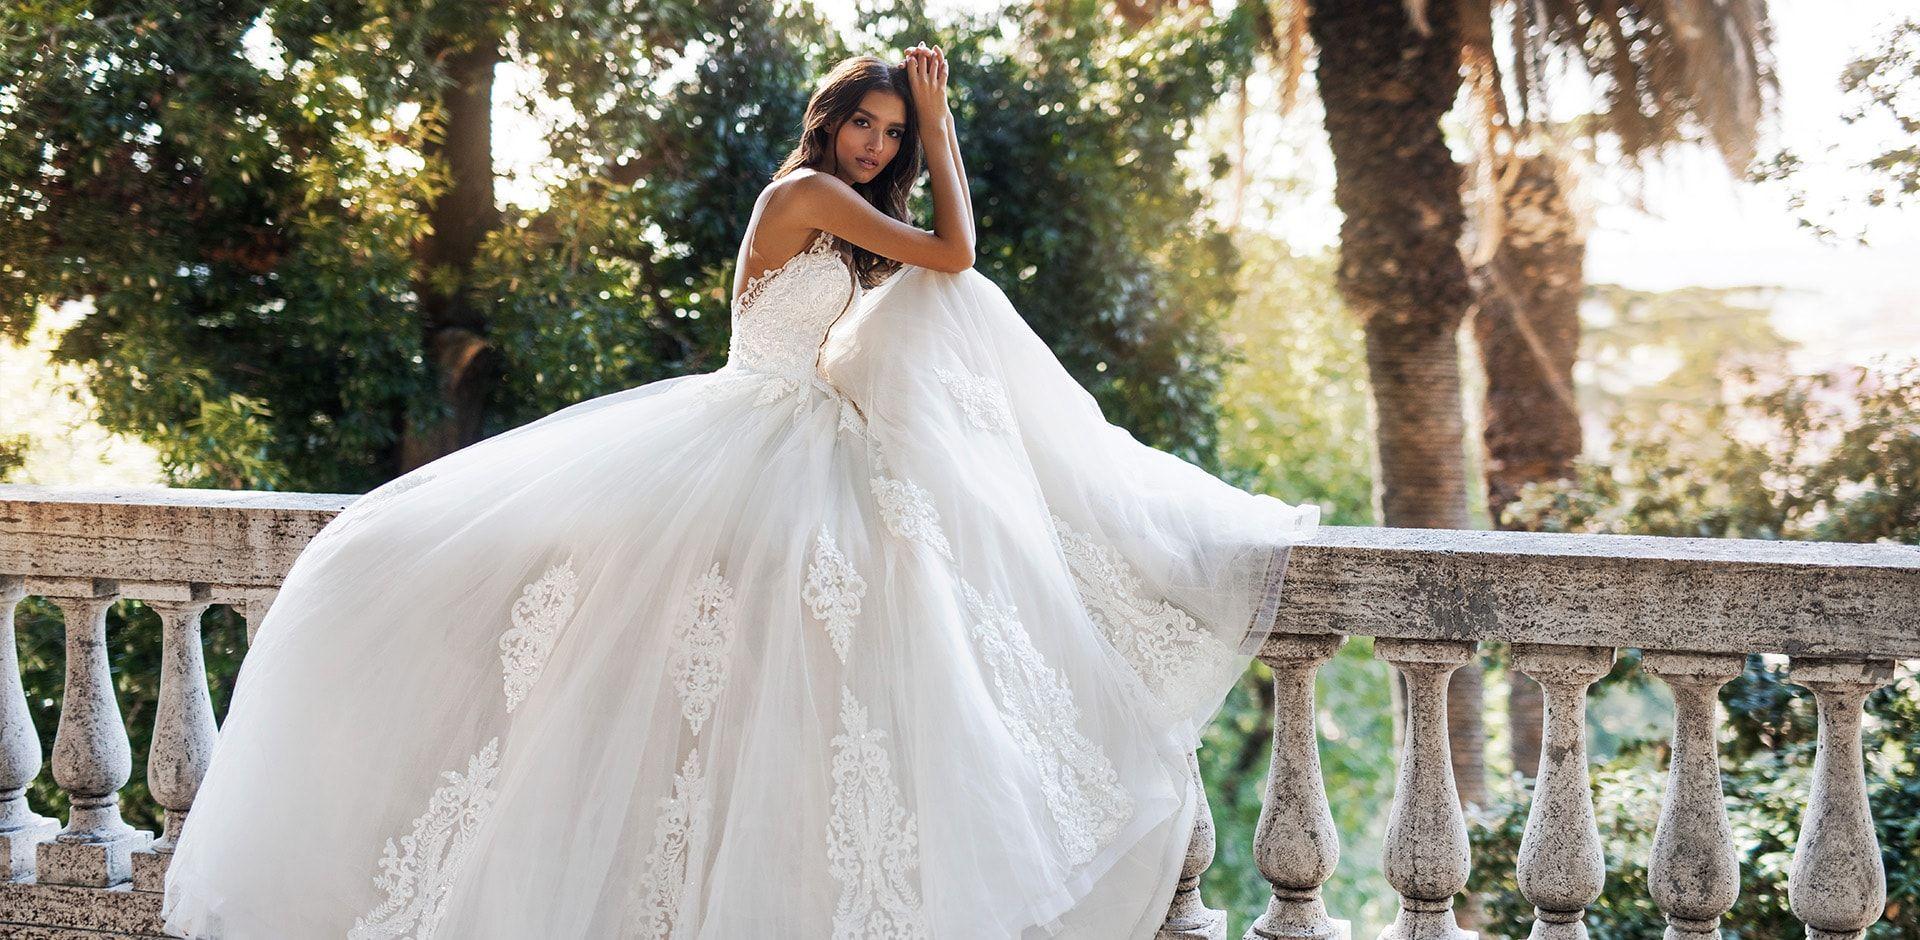 5 Wedding Dress Trends For 2021